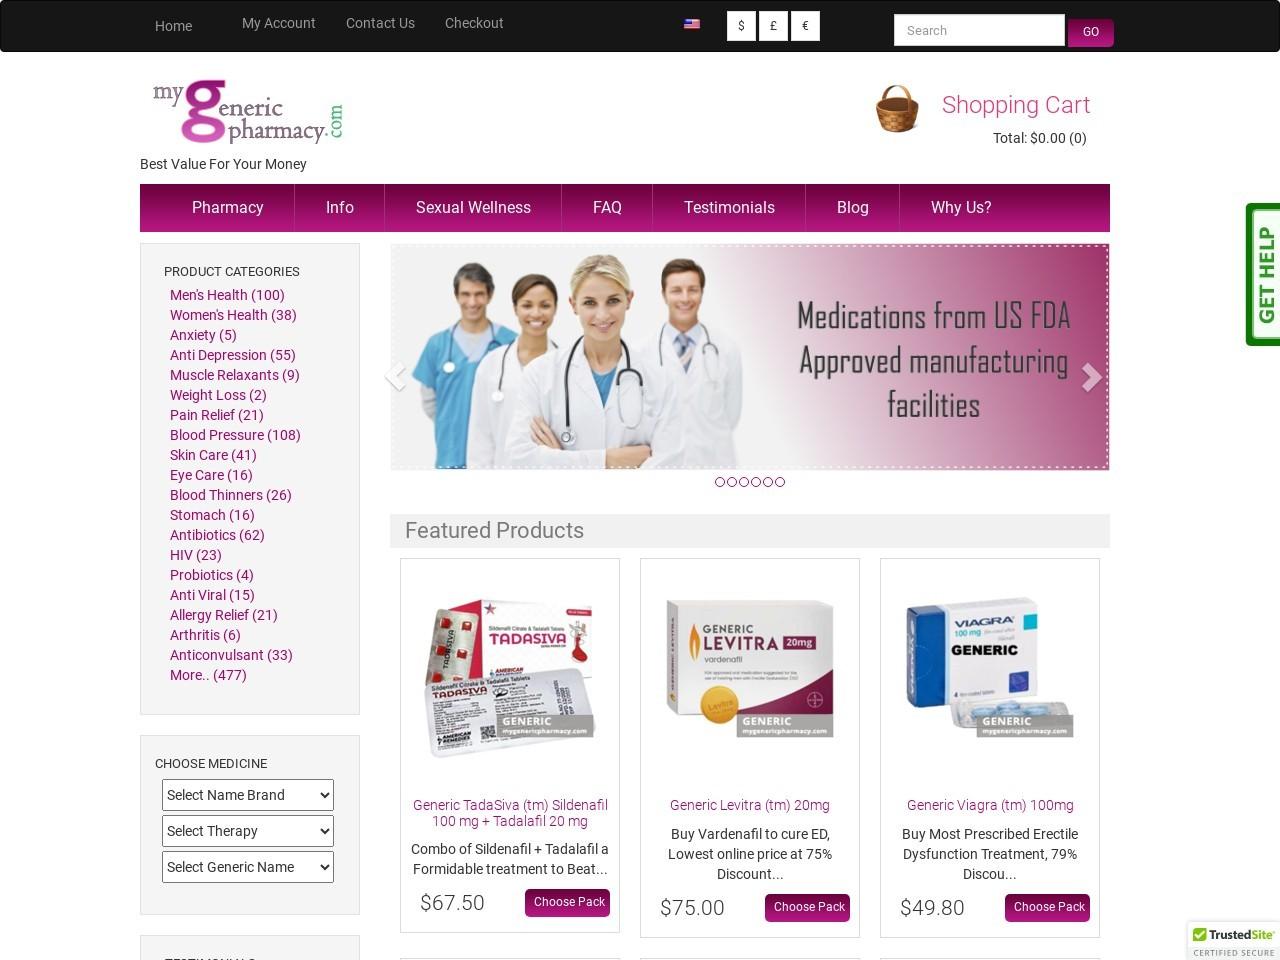 Online Generic Daklinza, Daclatasvir, for USA, Europe, Canada, and Japan from my Generic Pharmacy